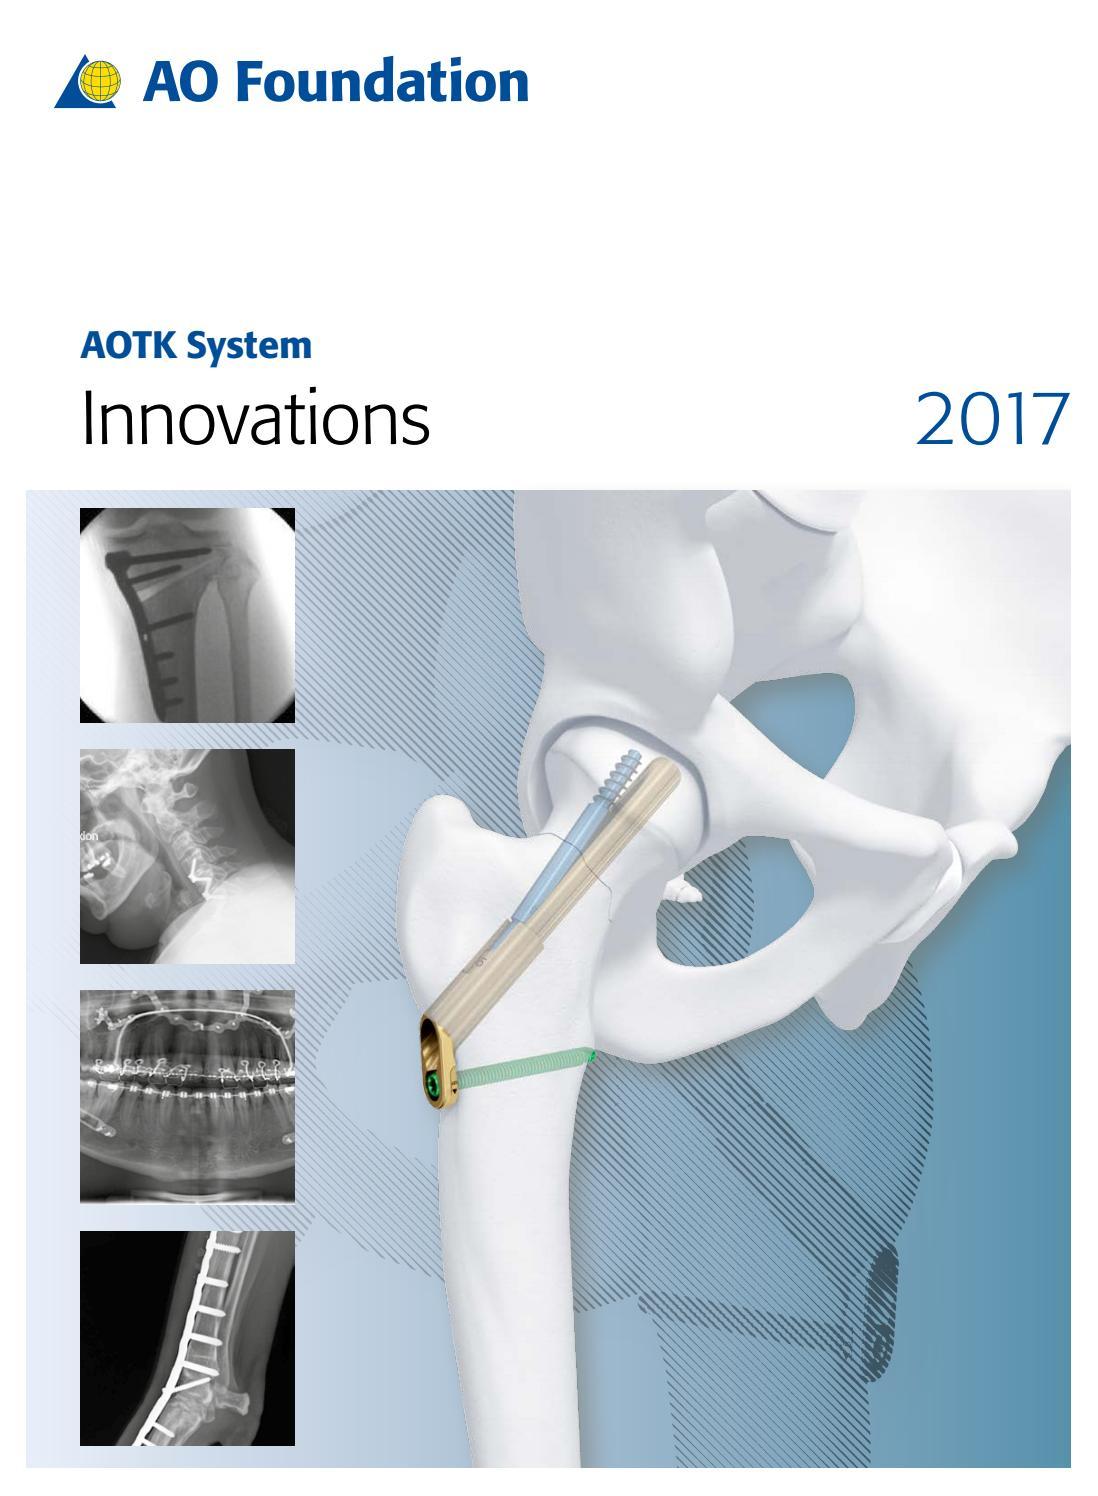 AOTK System Innovations | 2017 by AO Foundation - issuu